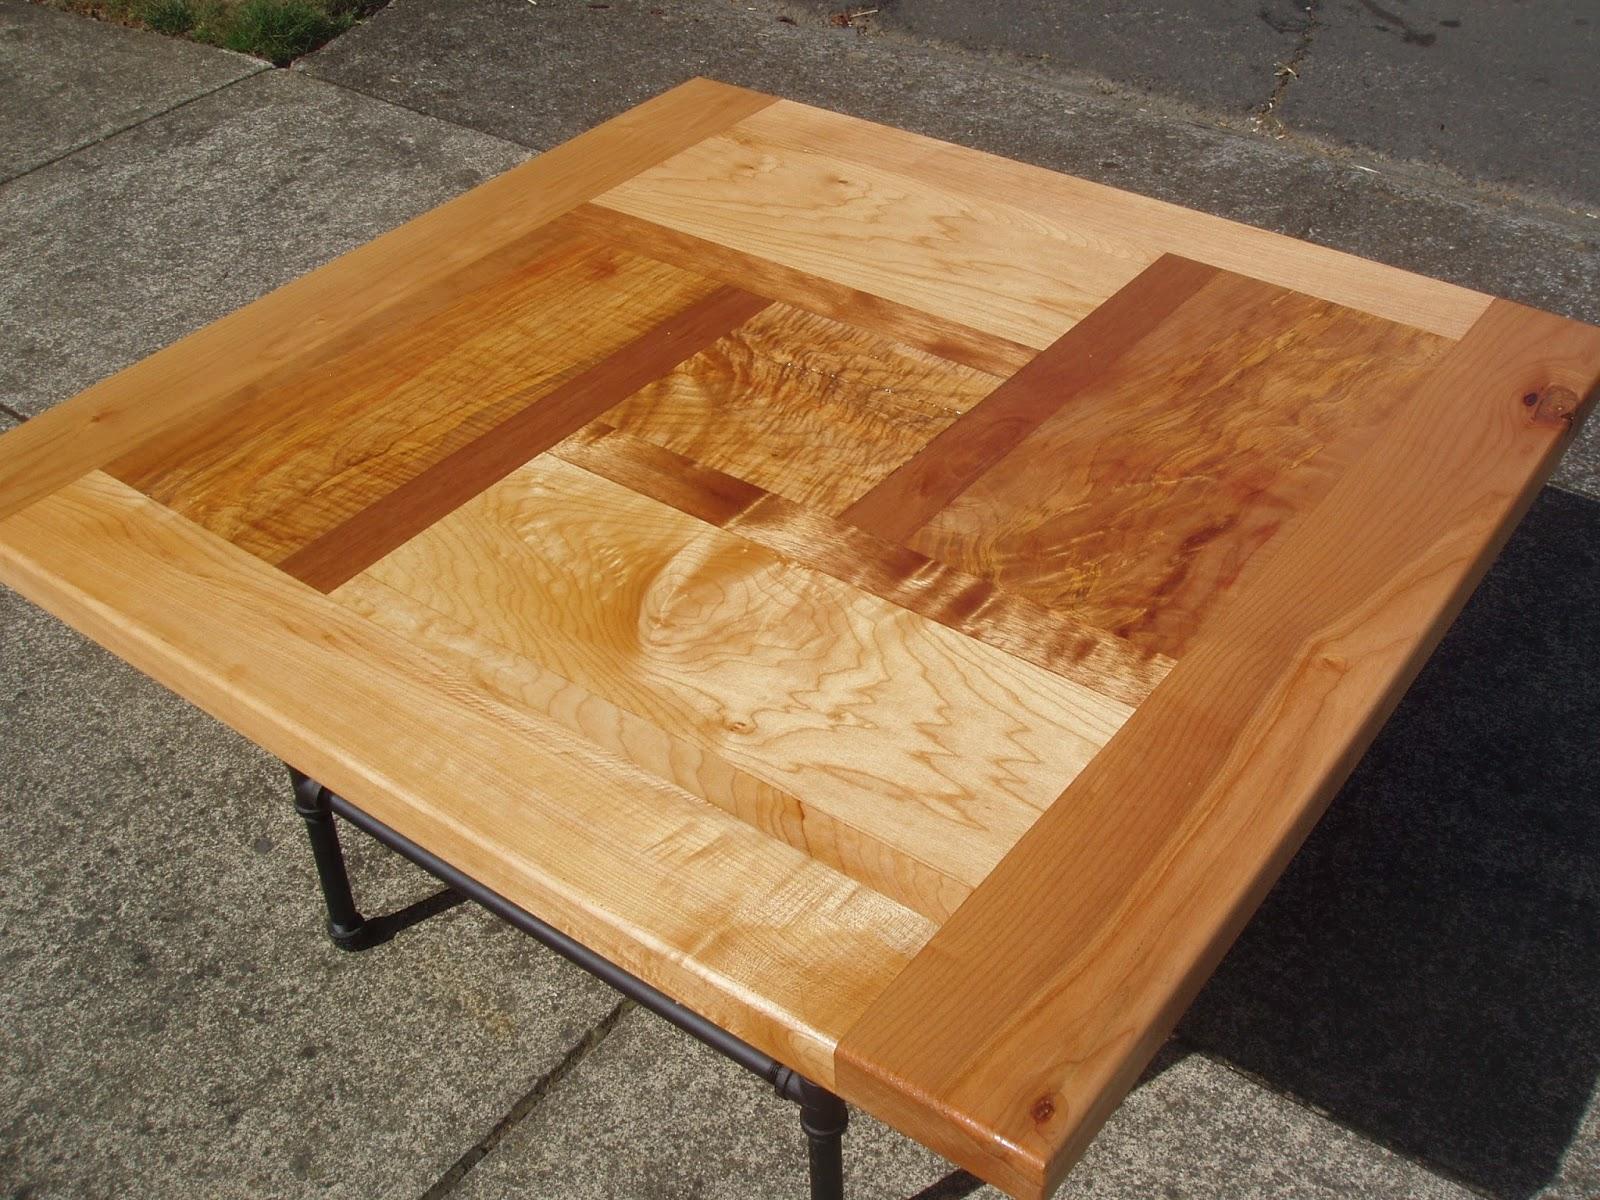 Driftedge Woodworking Pinwheel Design Coffee Table In